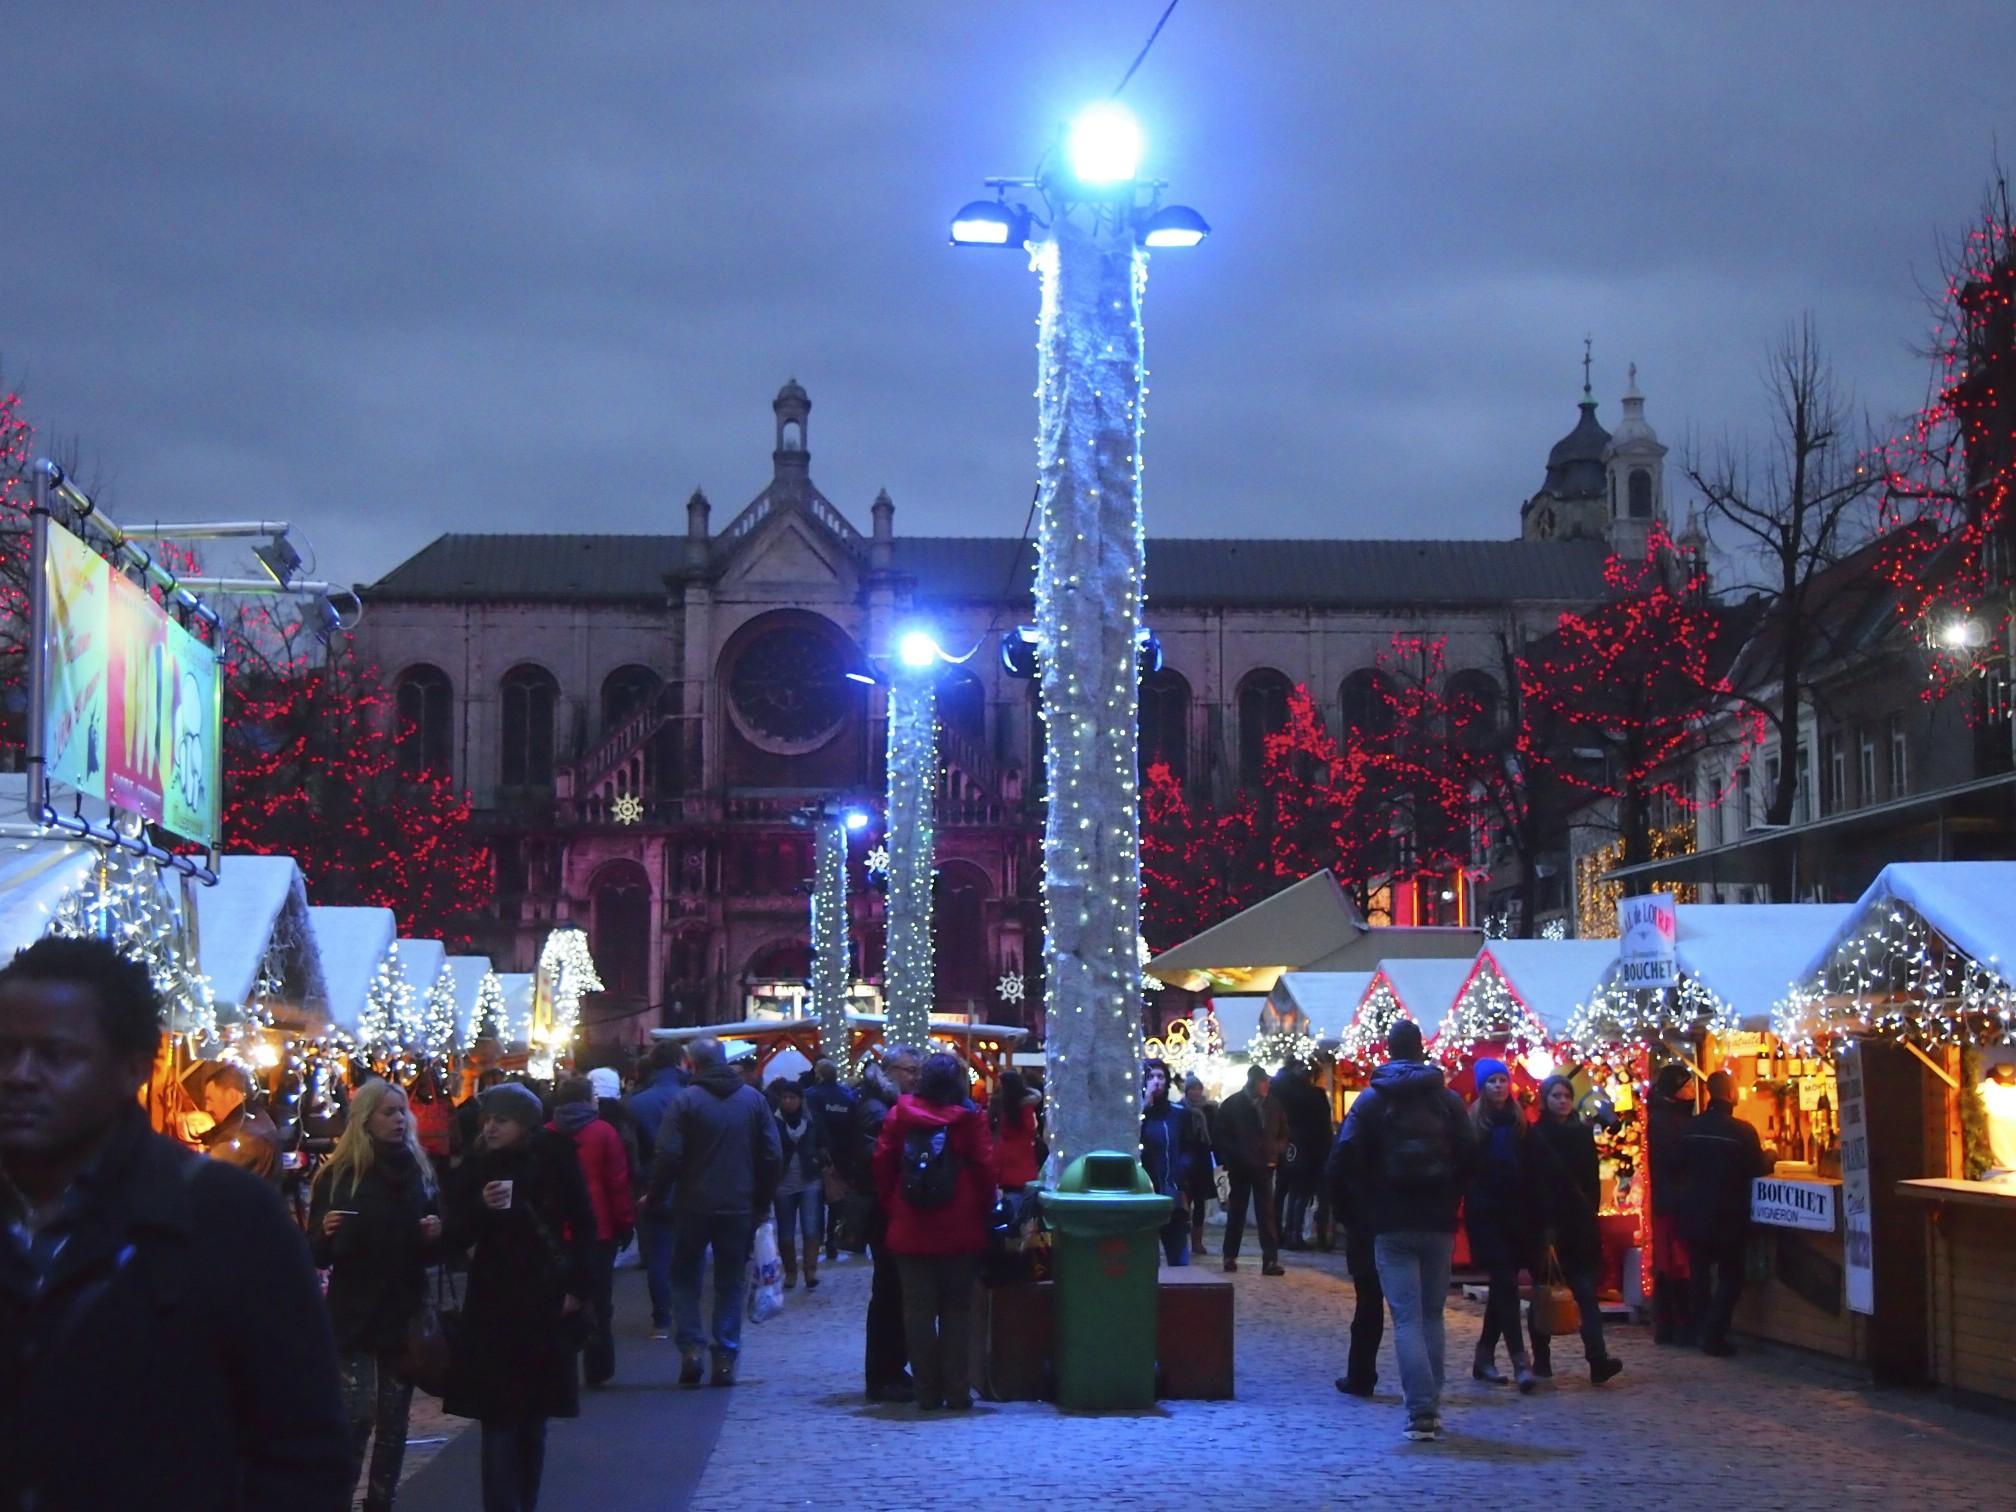 Christmas market in brussels, belgium photo